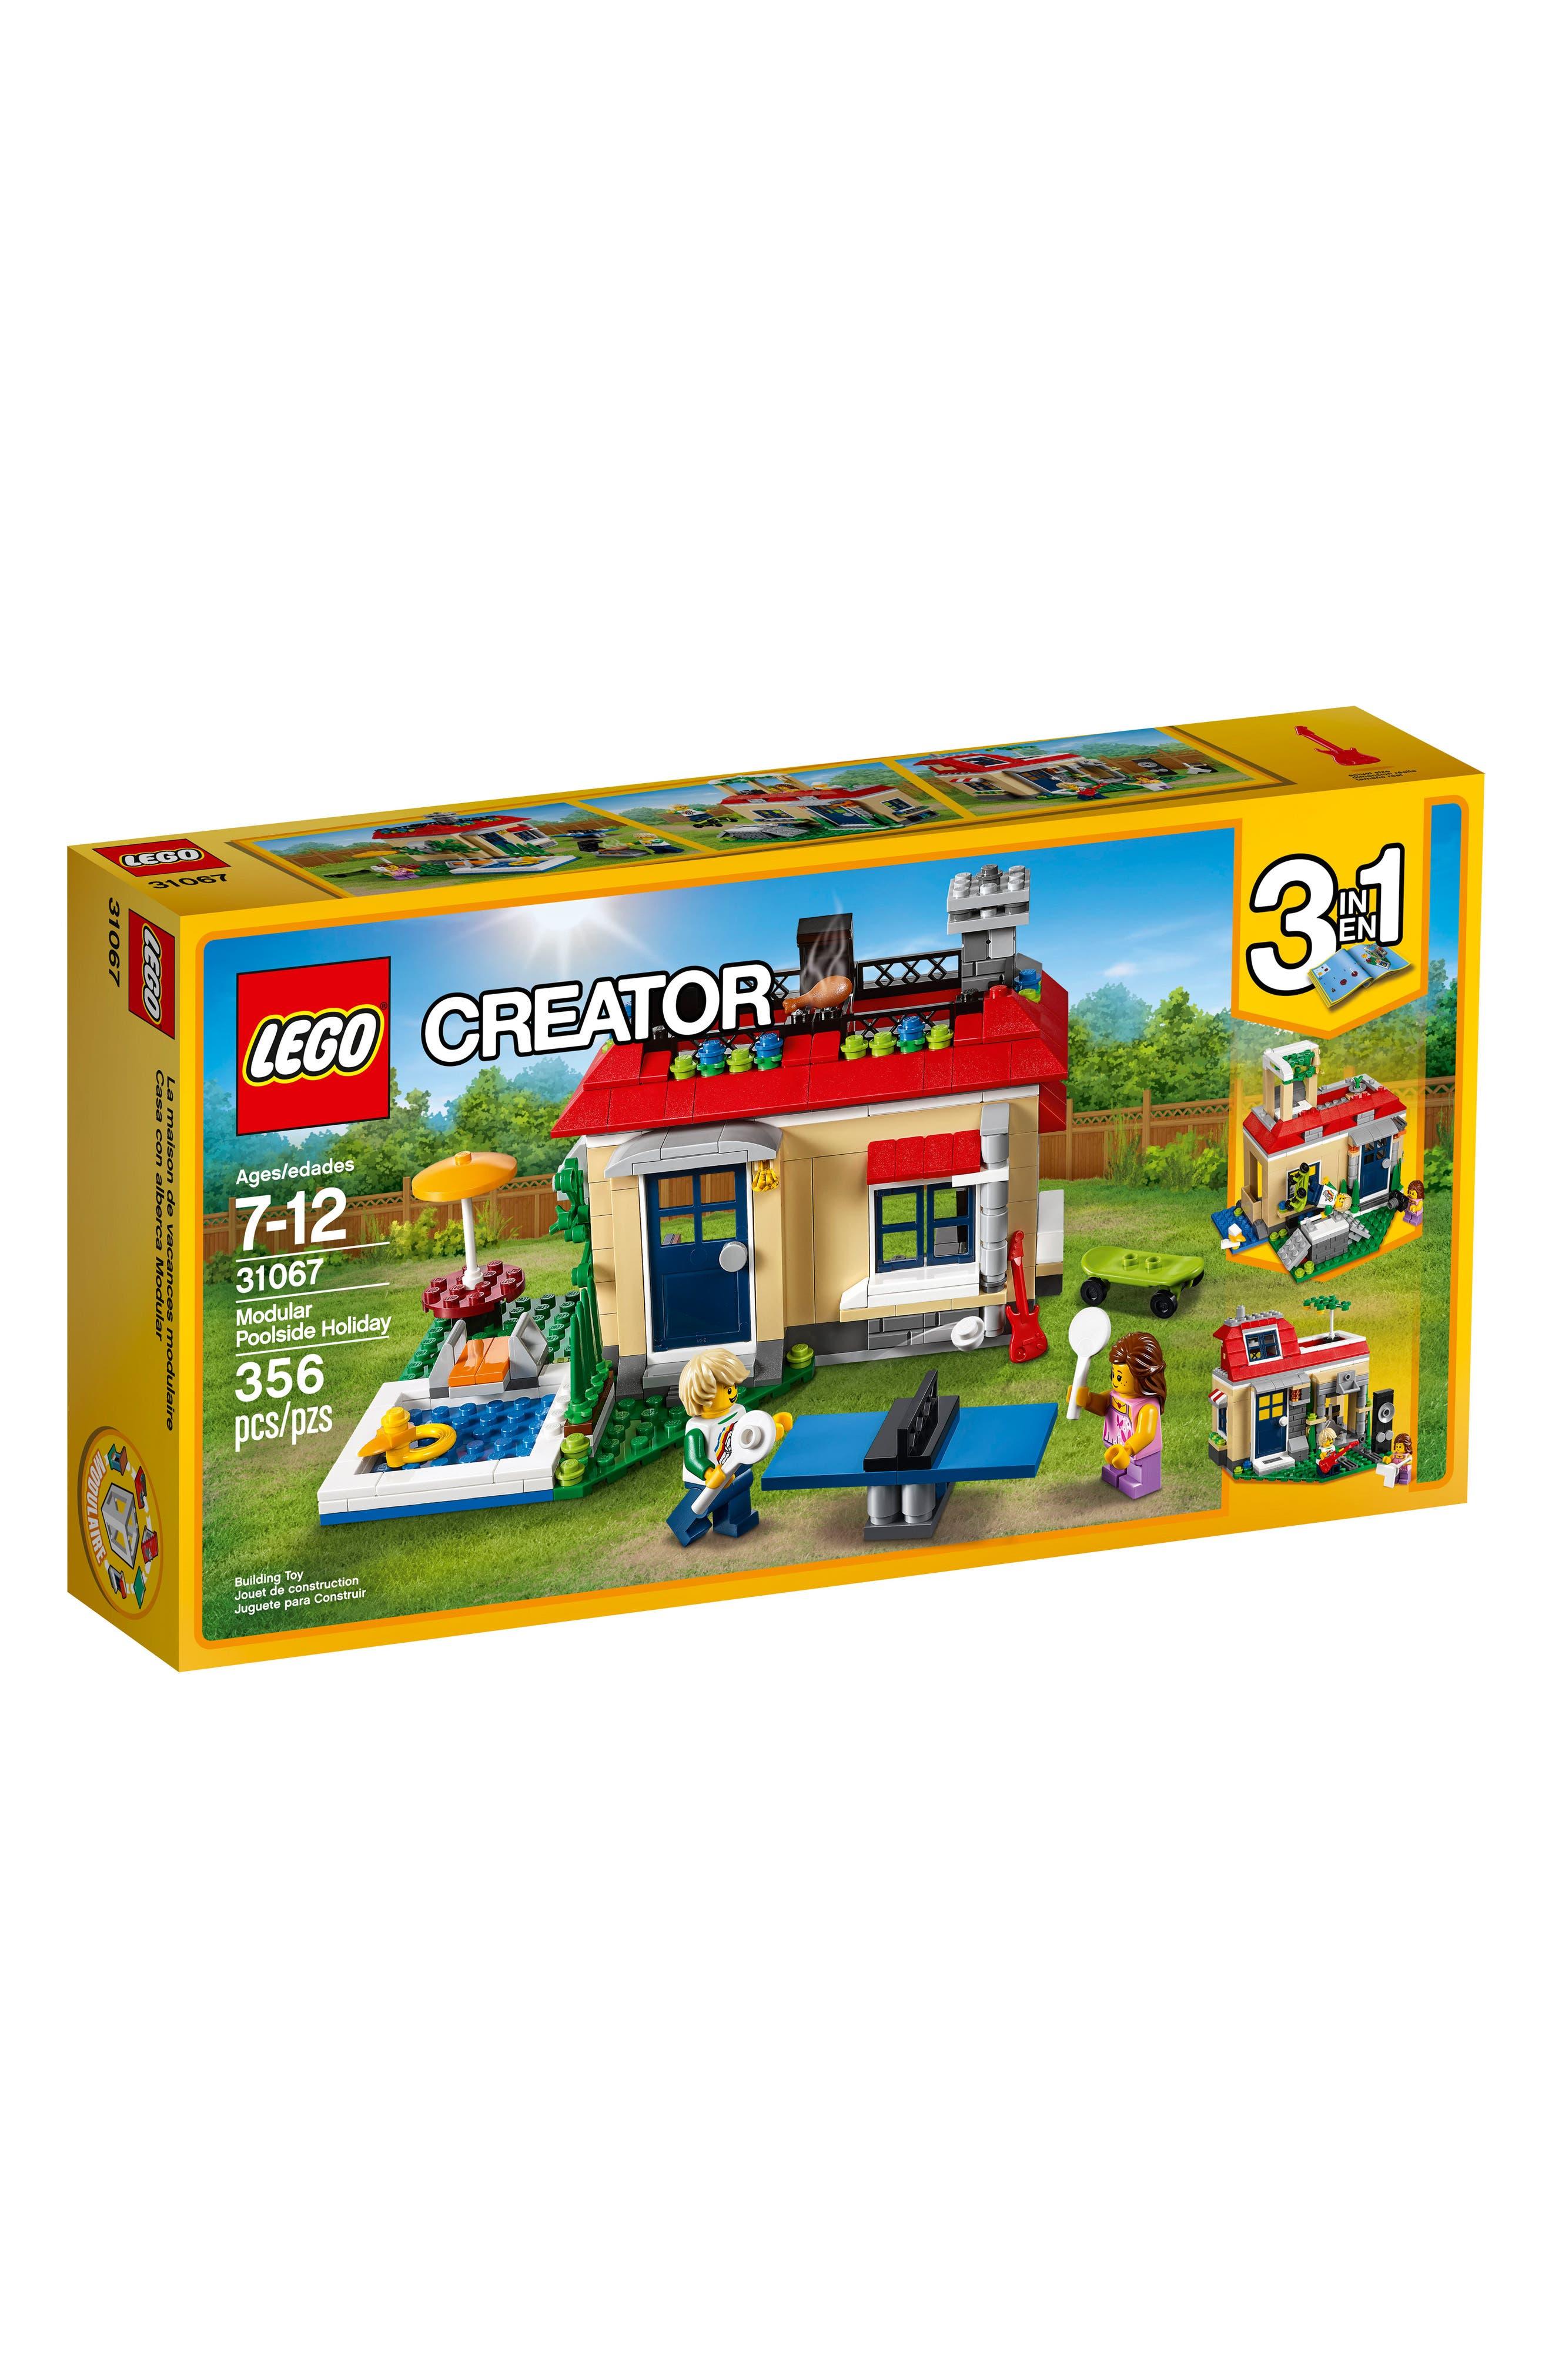 Creator 3-in-1 Modular Poolside Holiday Play Set - 31067,                             Main thumbnail 1, color,                             250